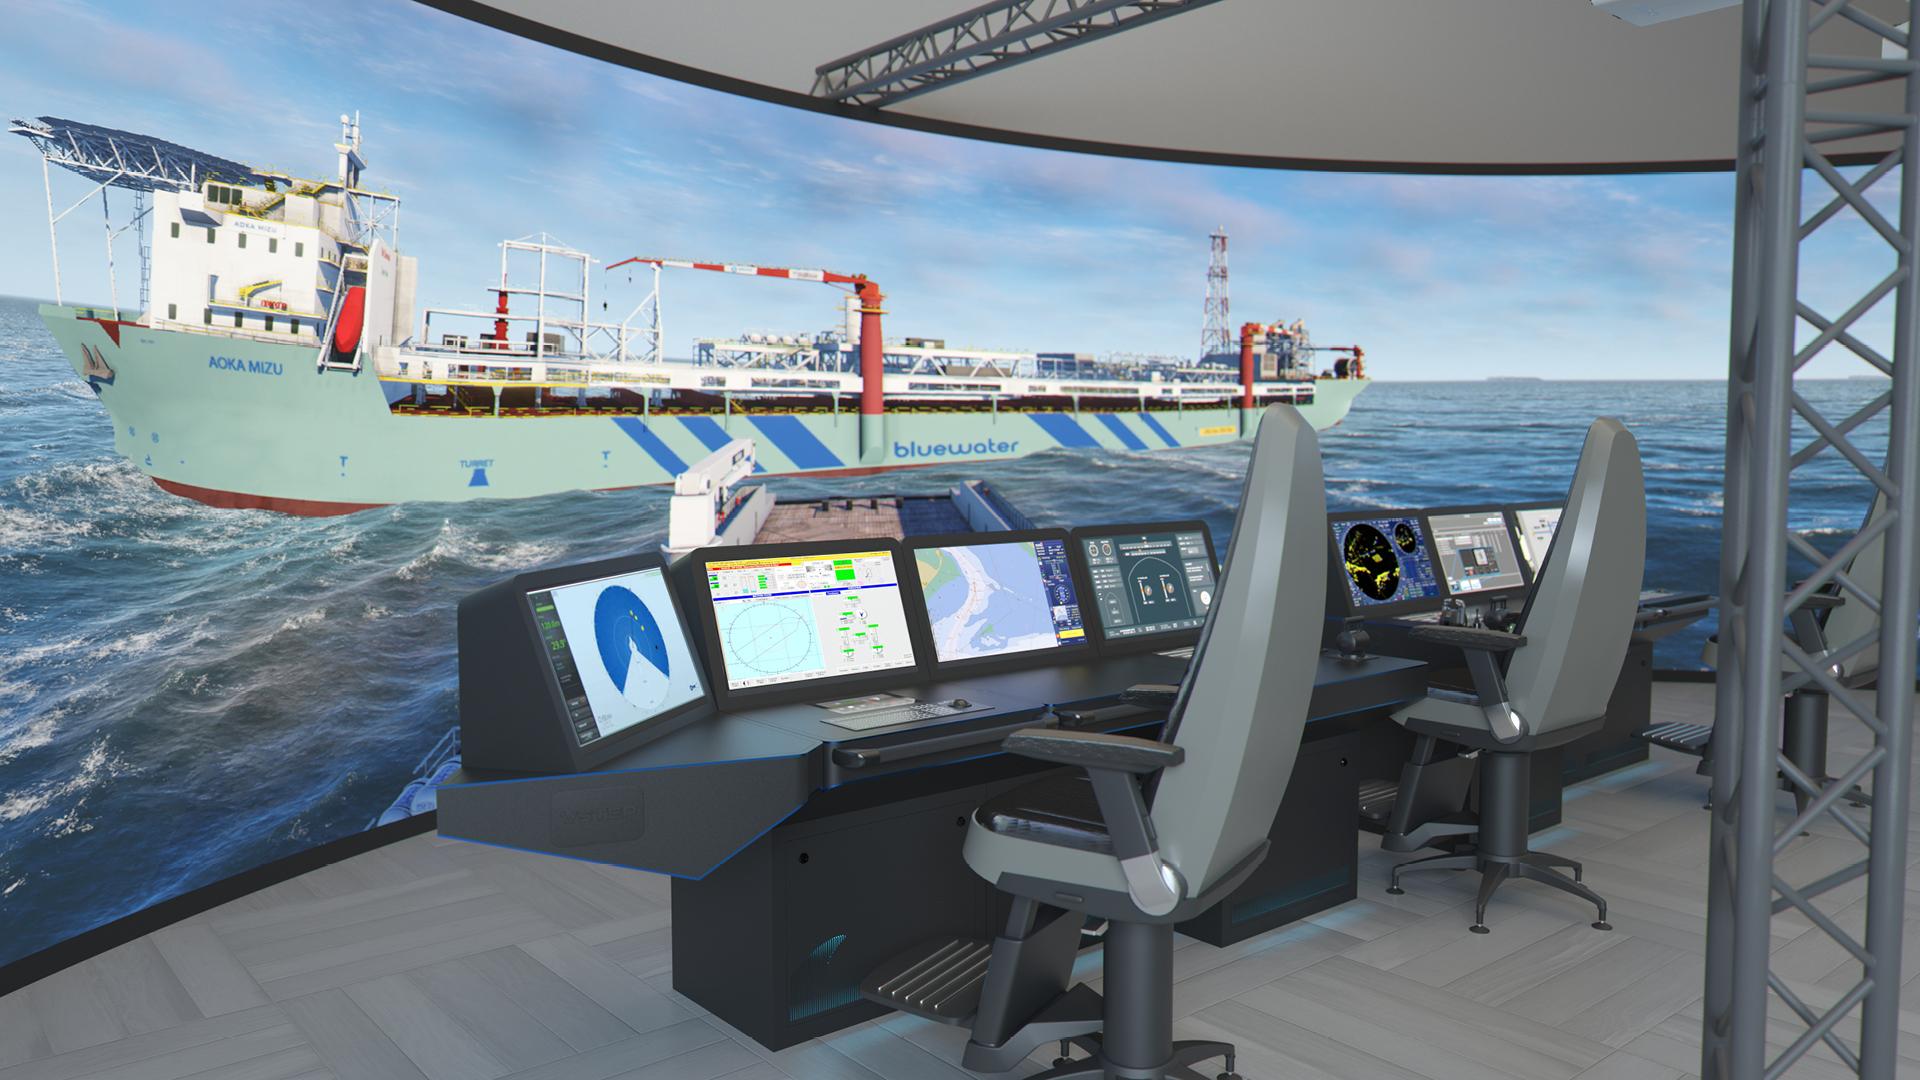 NAUTIS Maritime Simulator - VSTEP Simulation